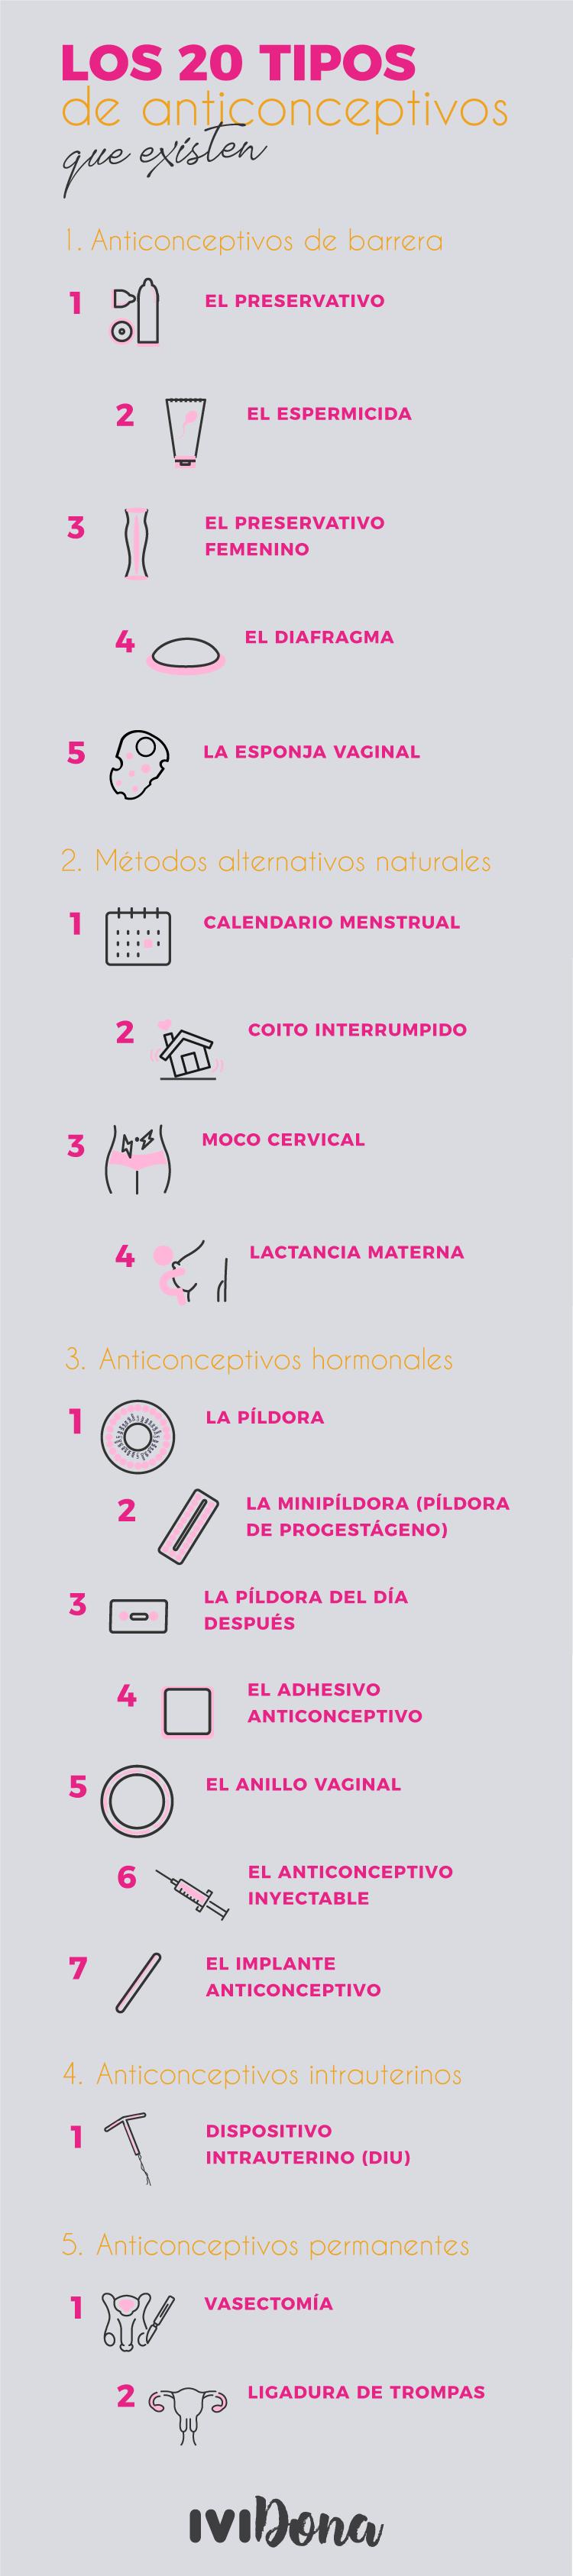 ipos de anticonceptivos-infografia-n